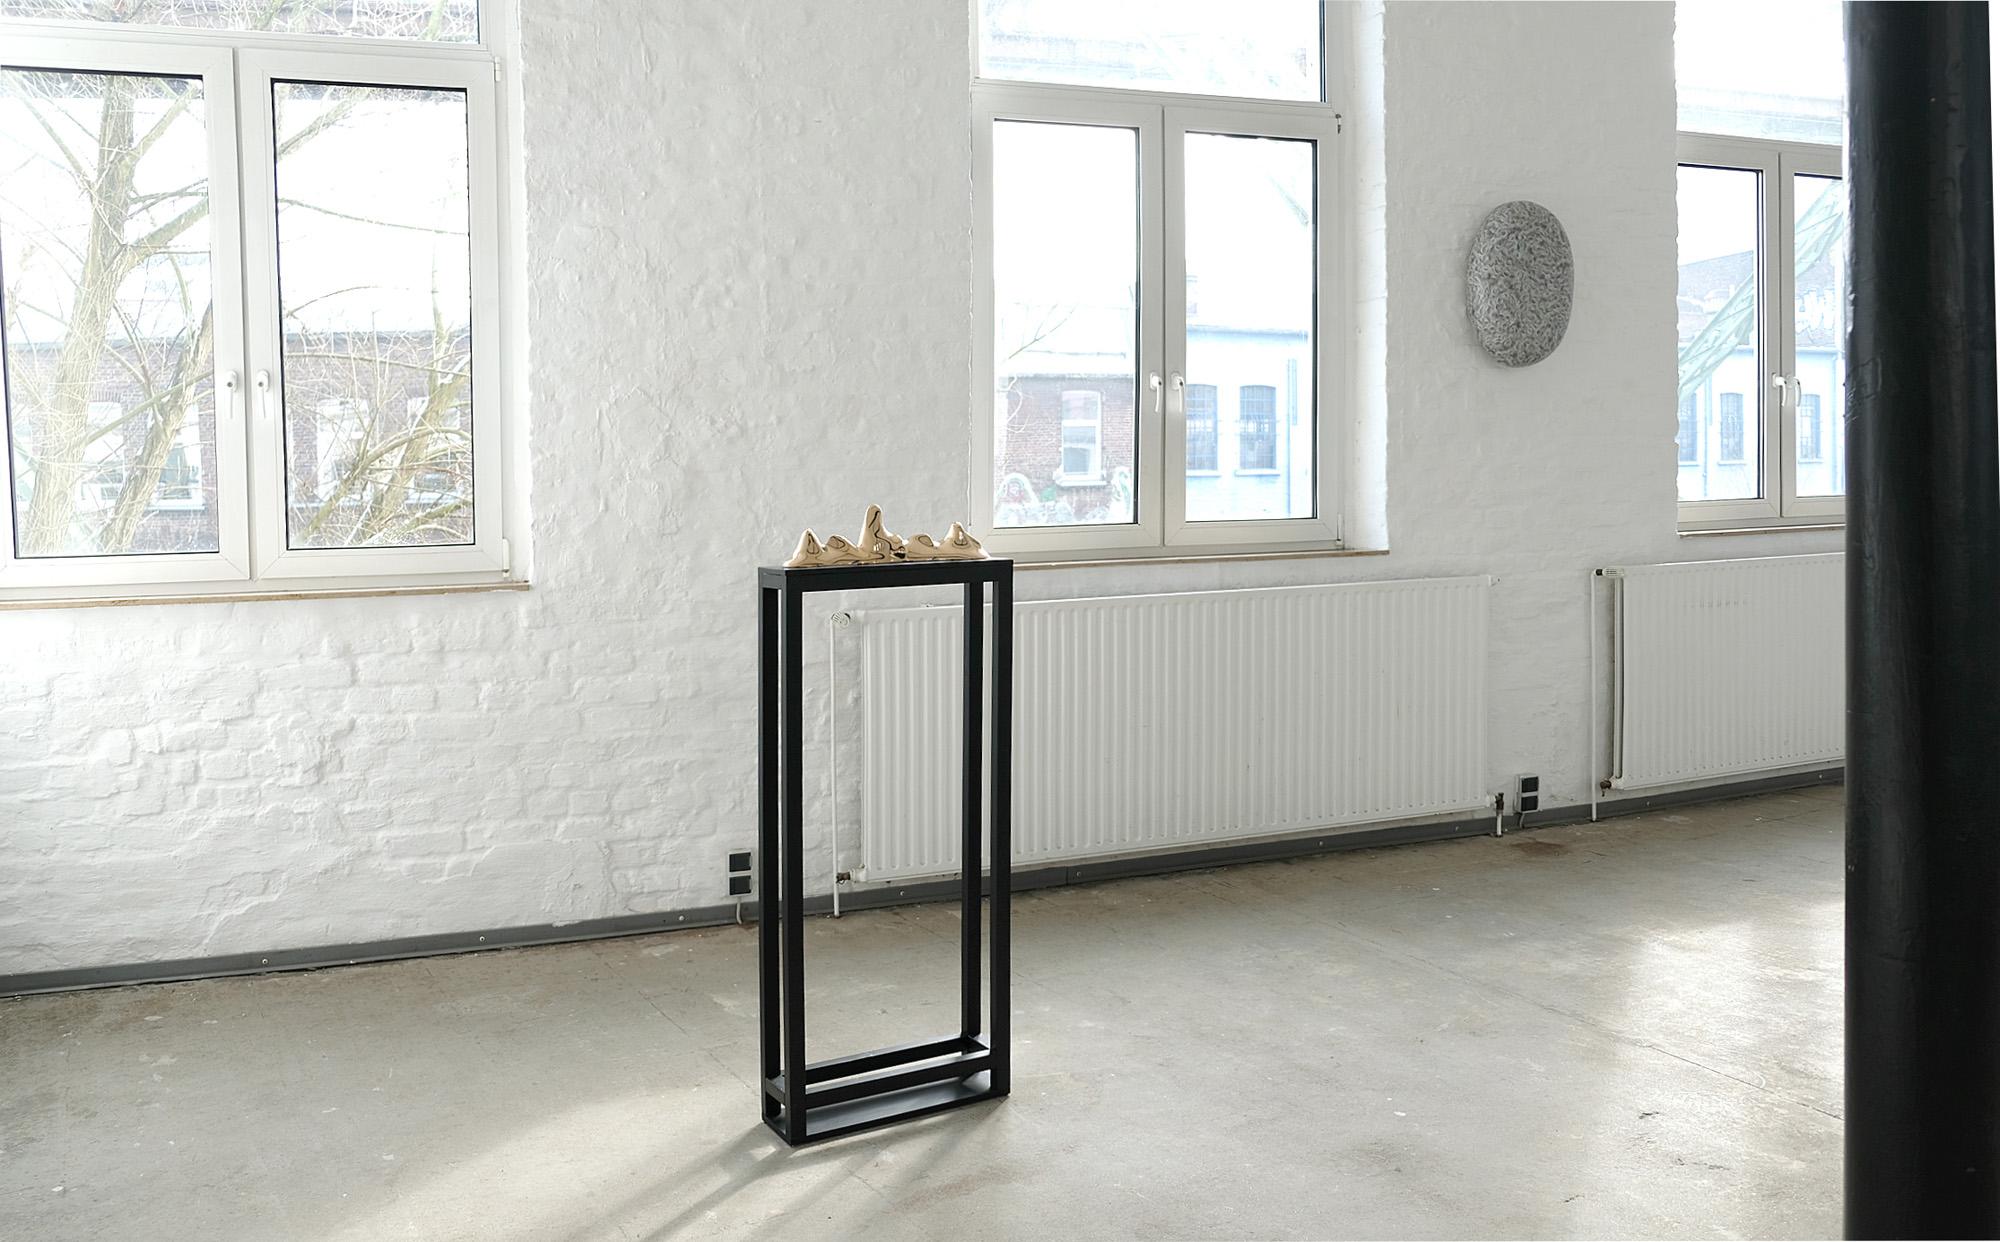 Raum2: Jaana Caspary